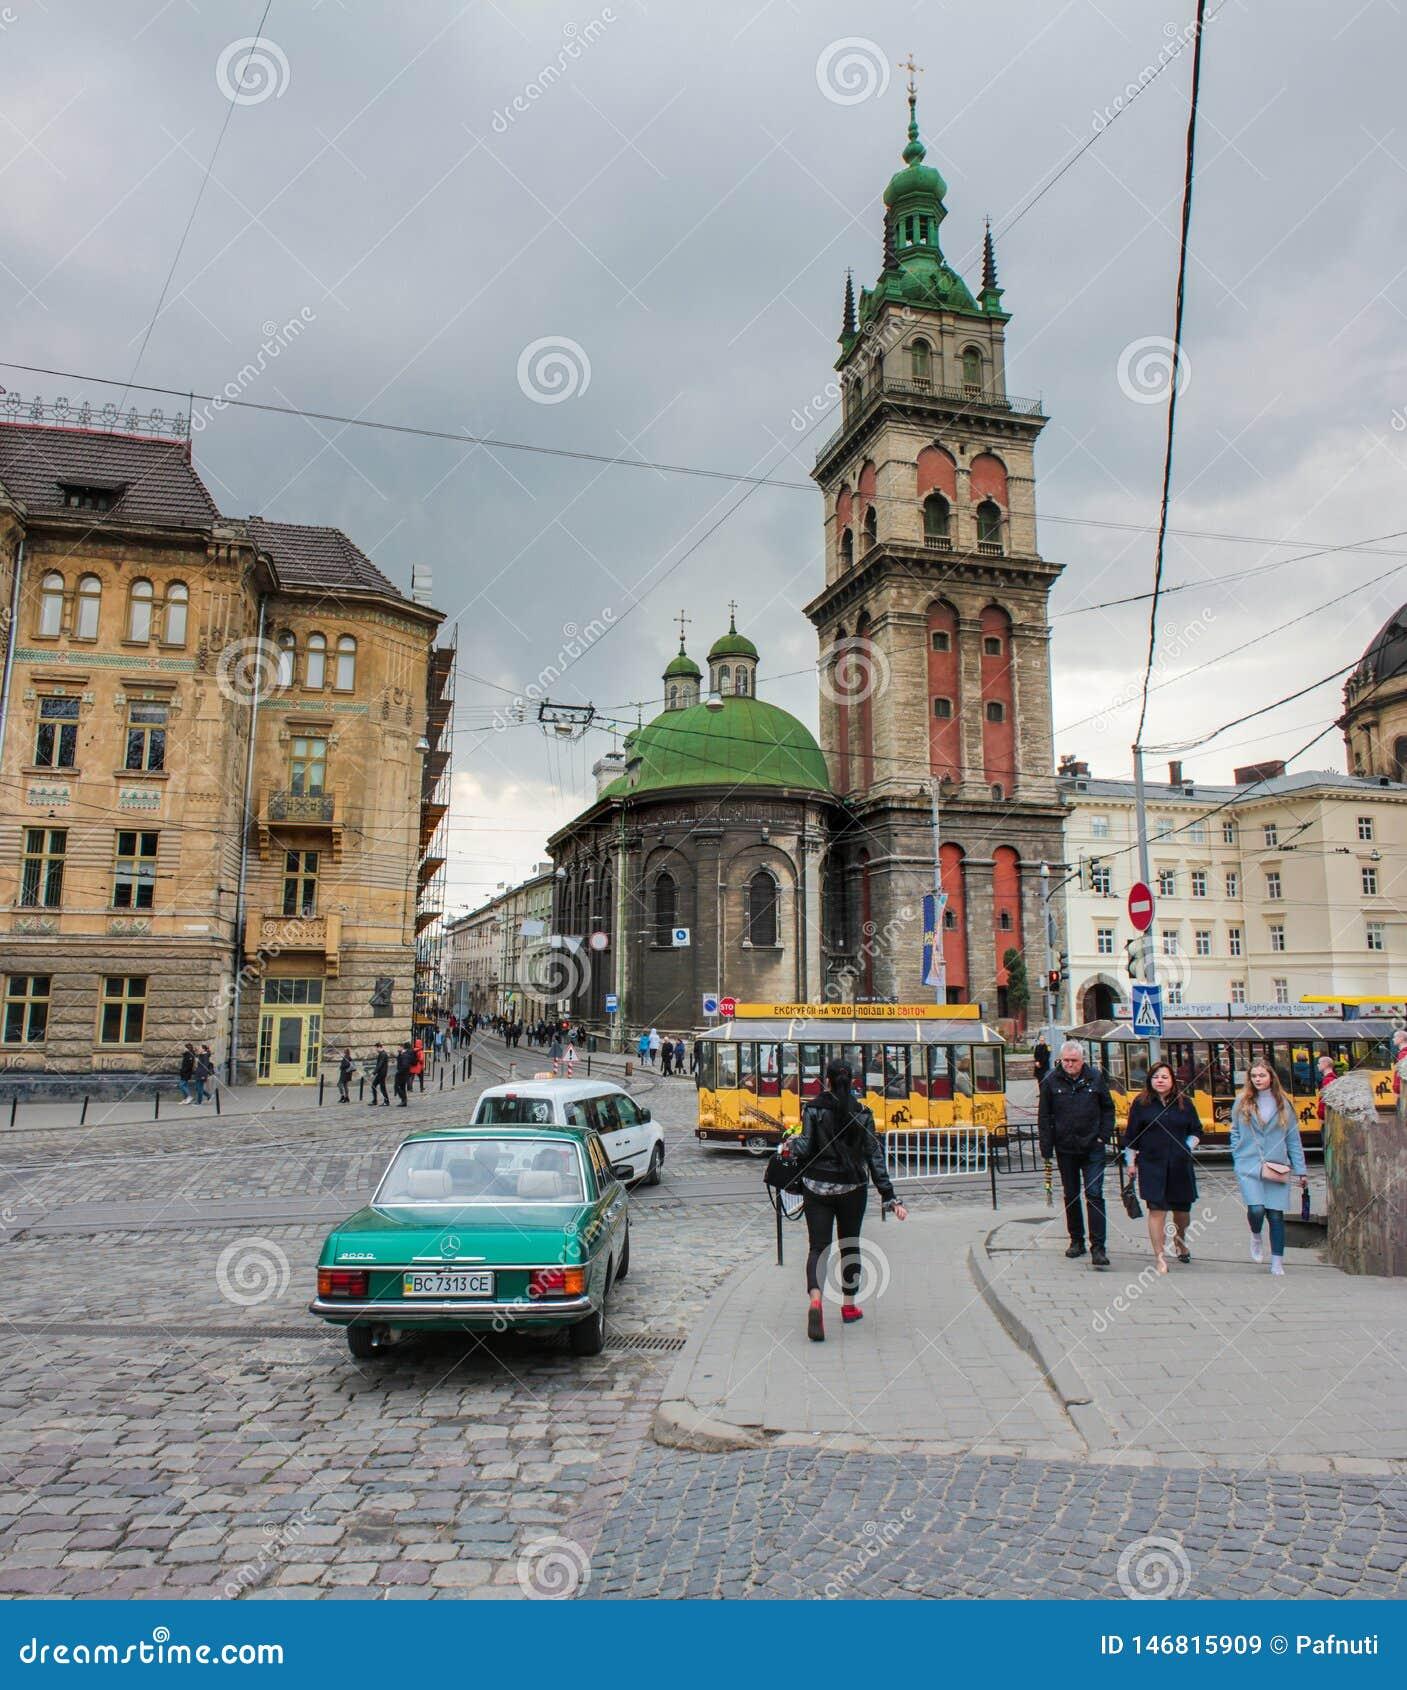 Lviv, Ukraine - April 19, 2019:Assumption of the Blessed Virgin Mary Church Tower of Korniakt. lviv - wonderful architectural